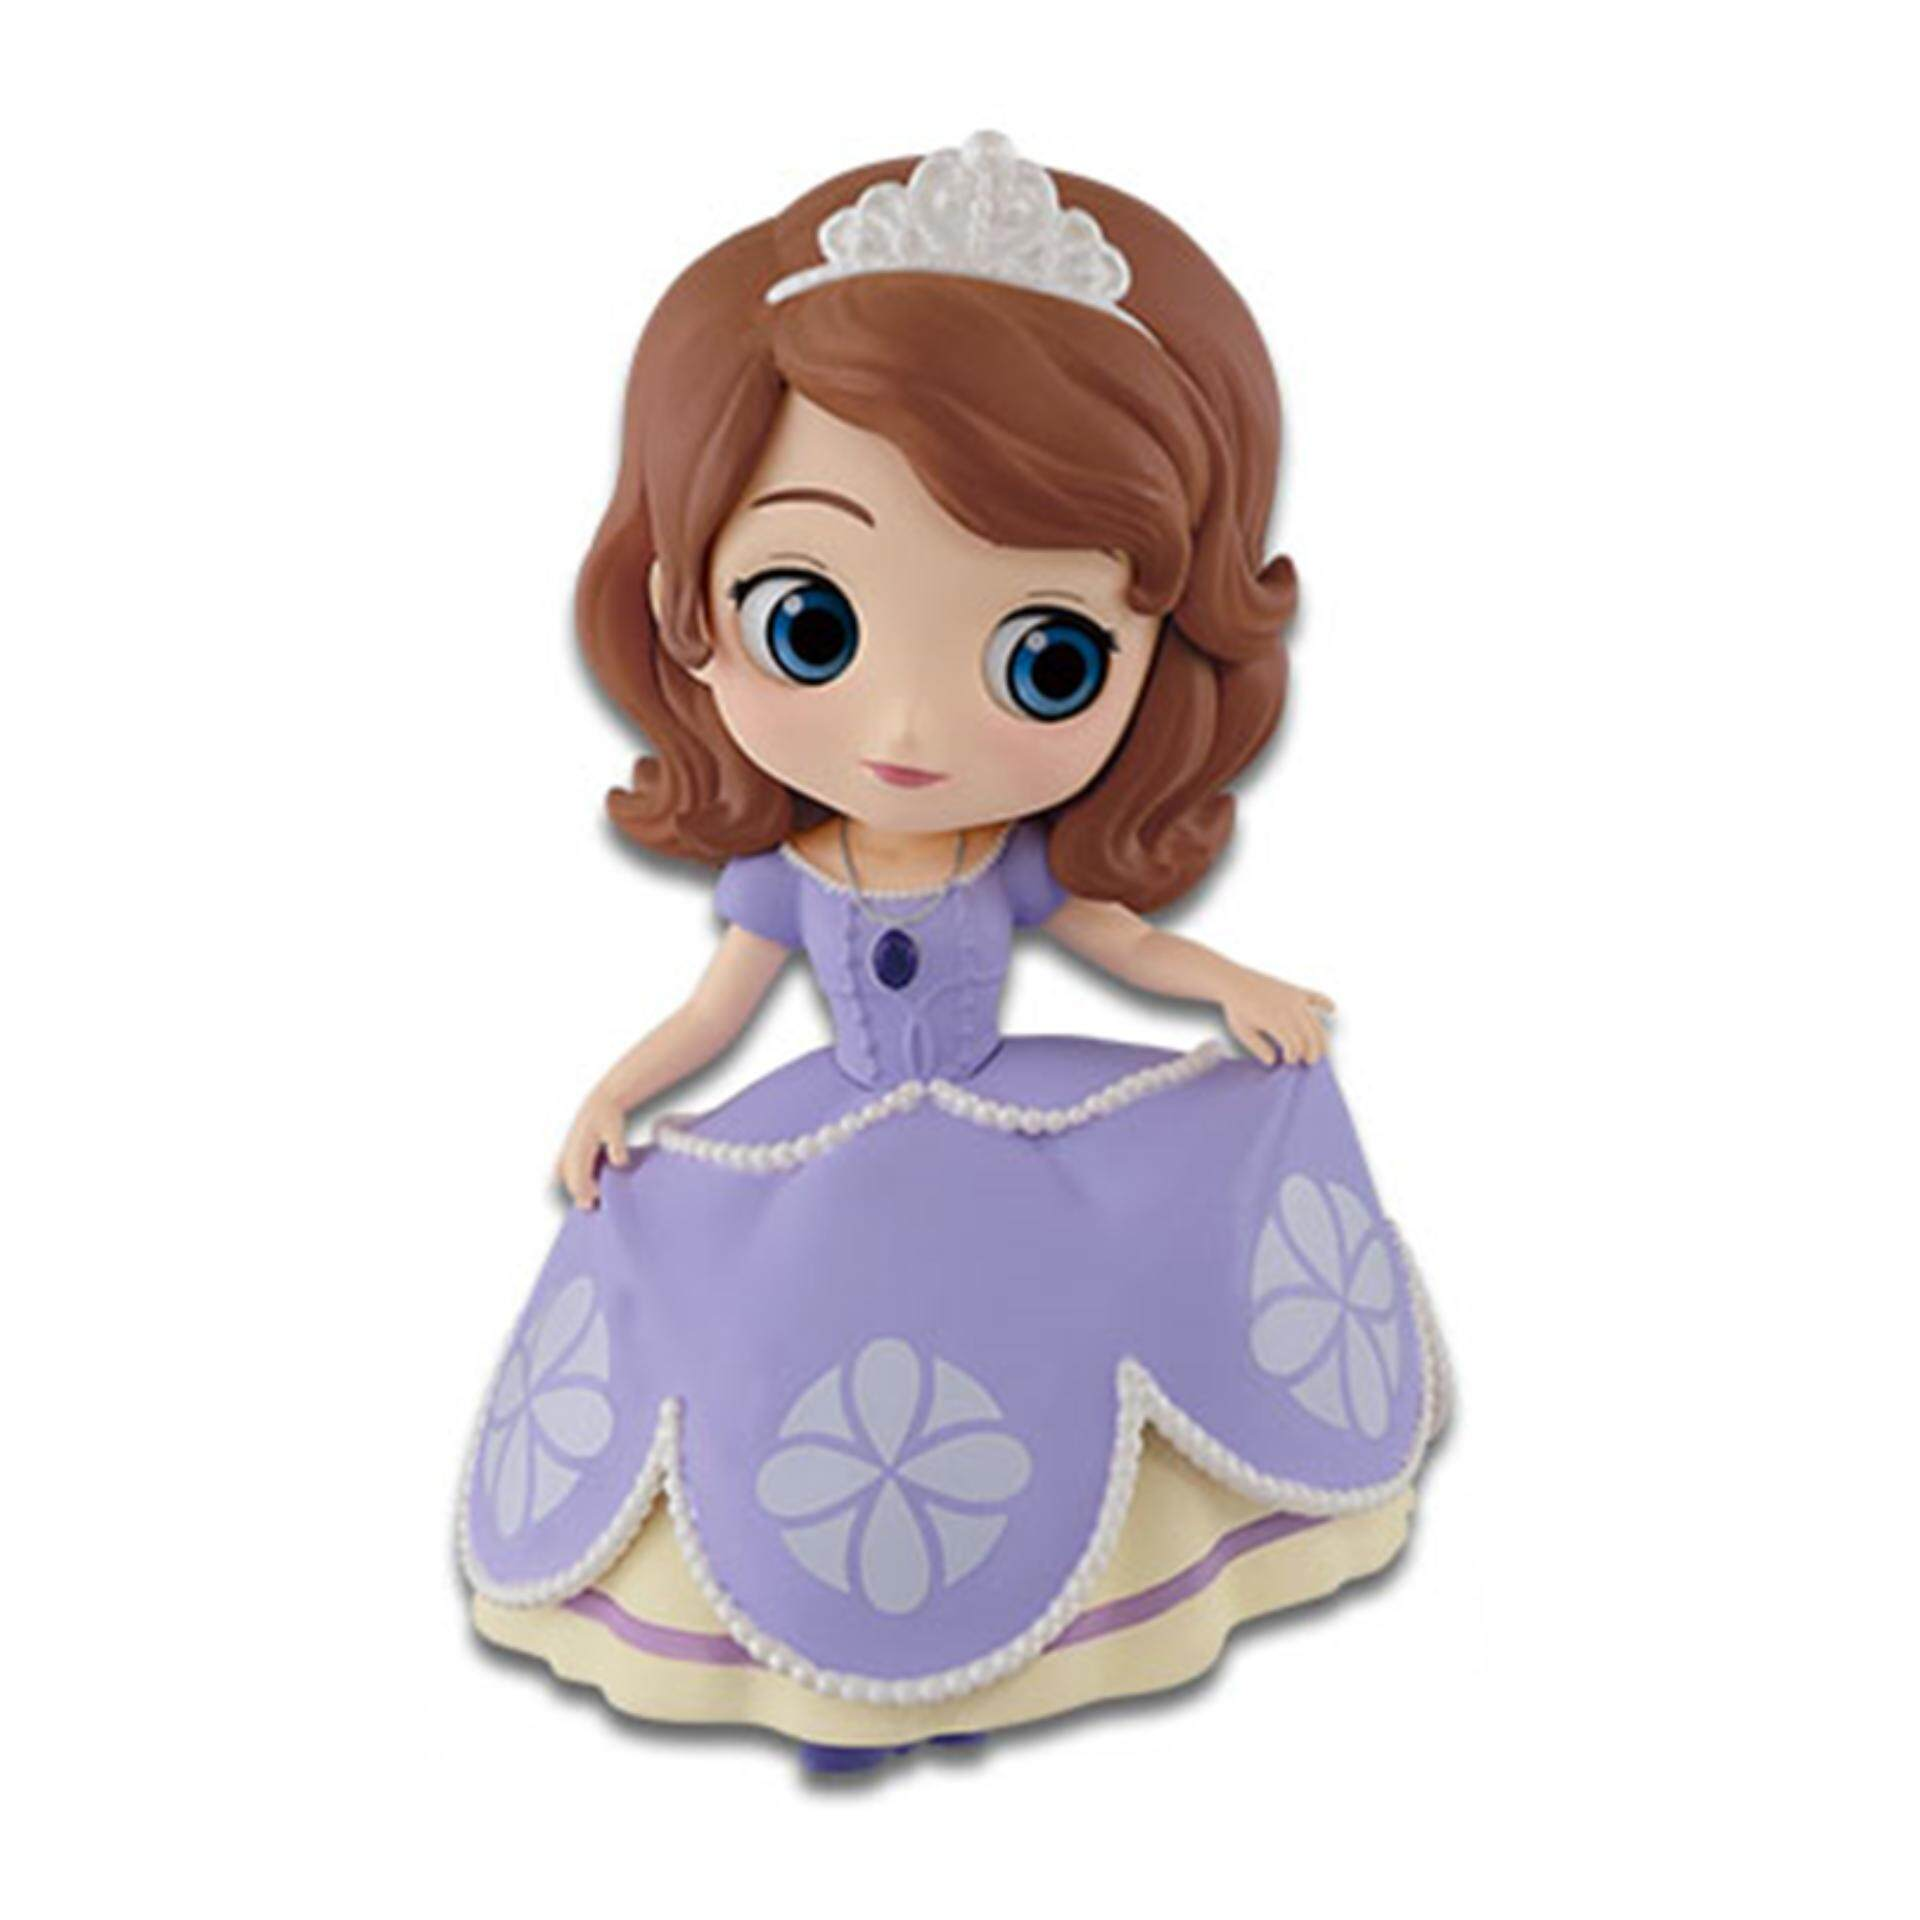 Banpresto Q Posket Disney Princess Petit Figure - Sofia